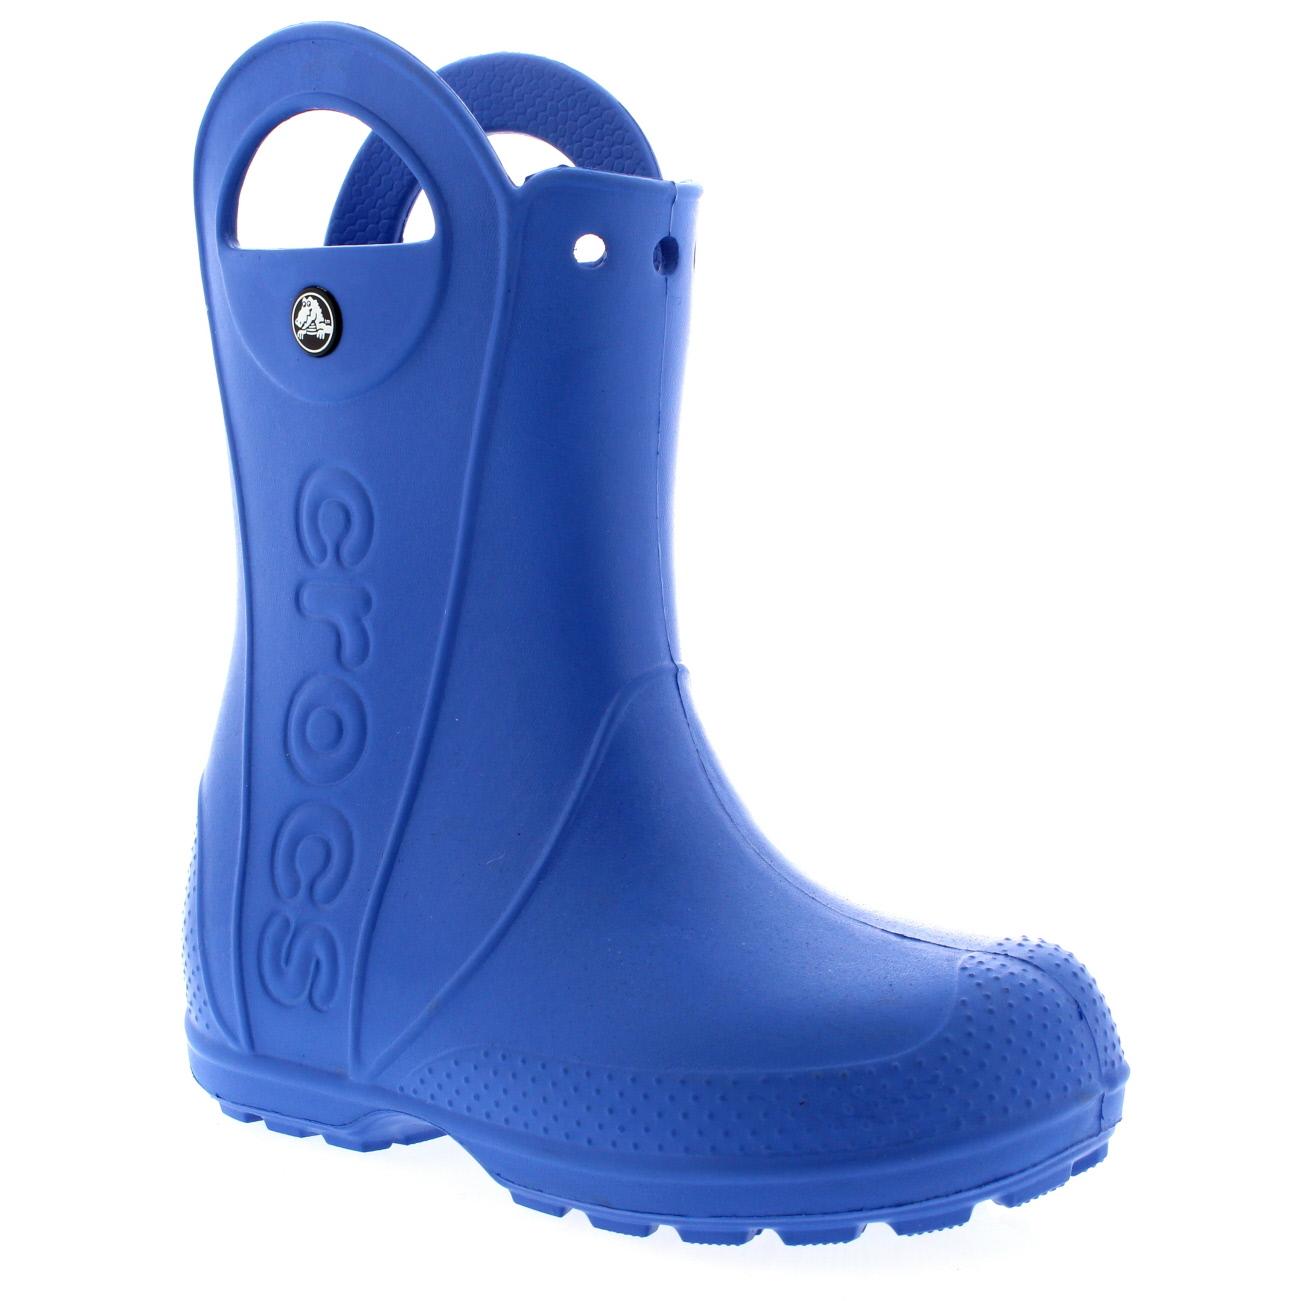 Unisex Kids Crocs Baya Shoes